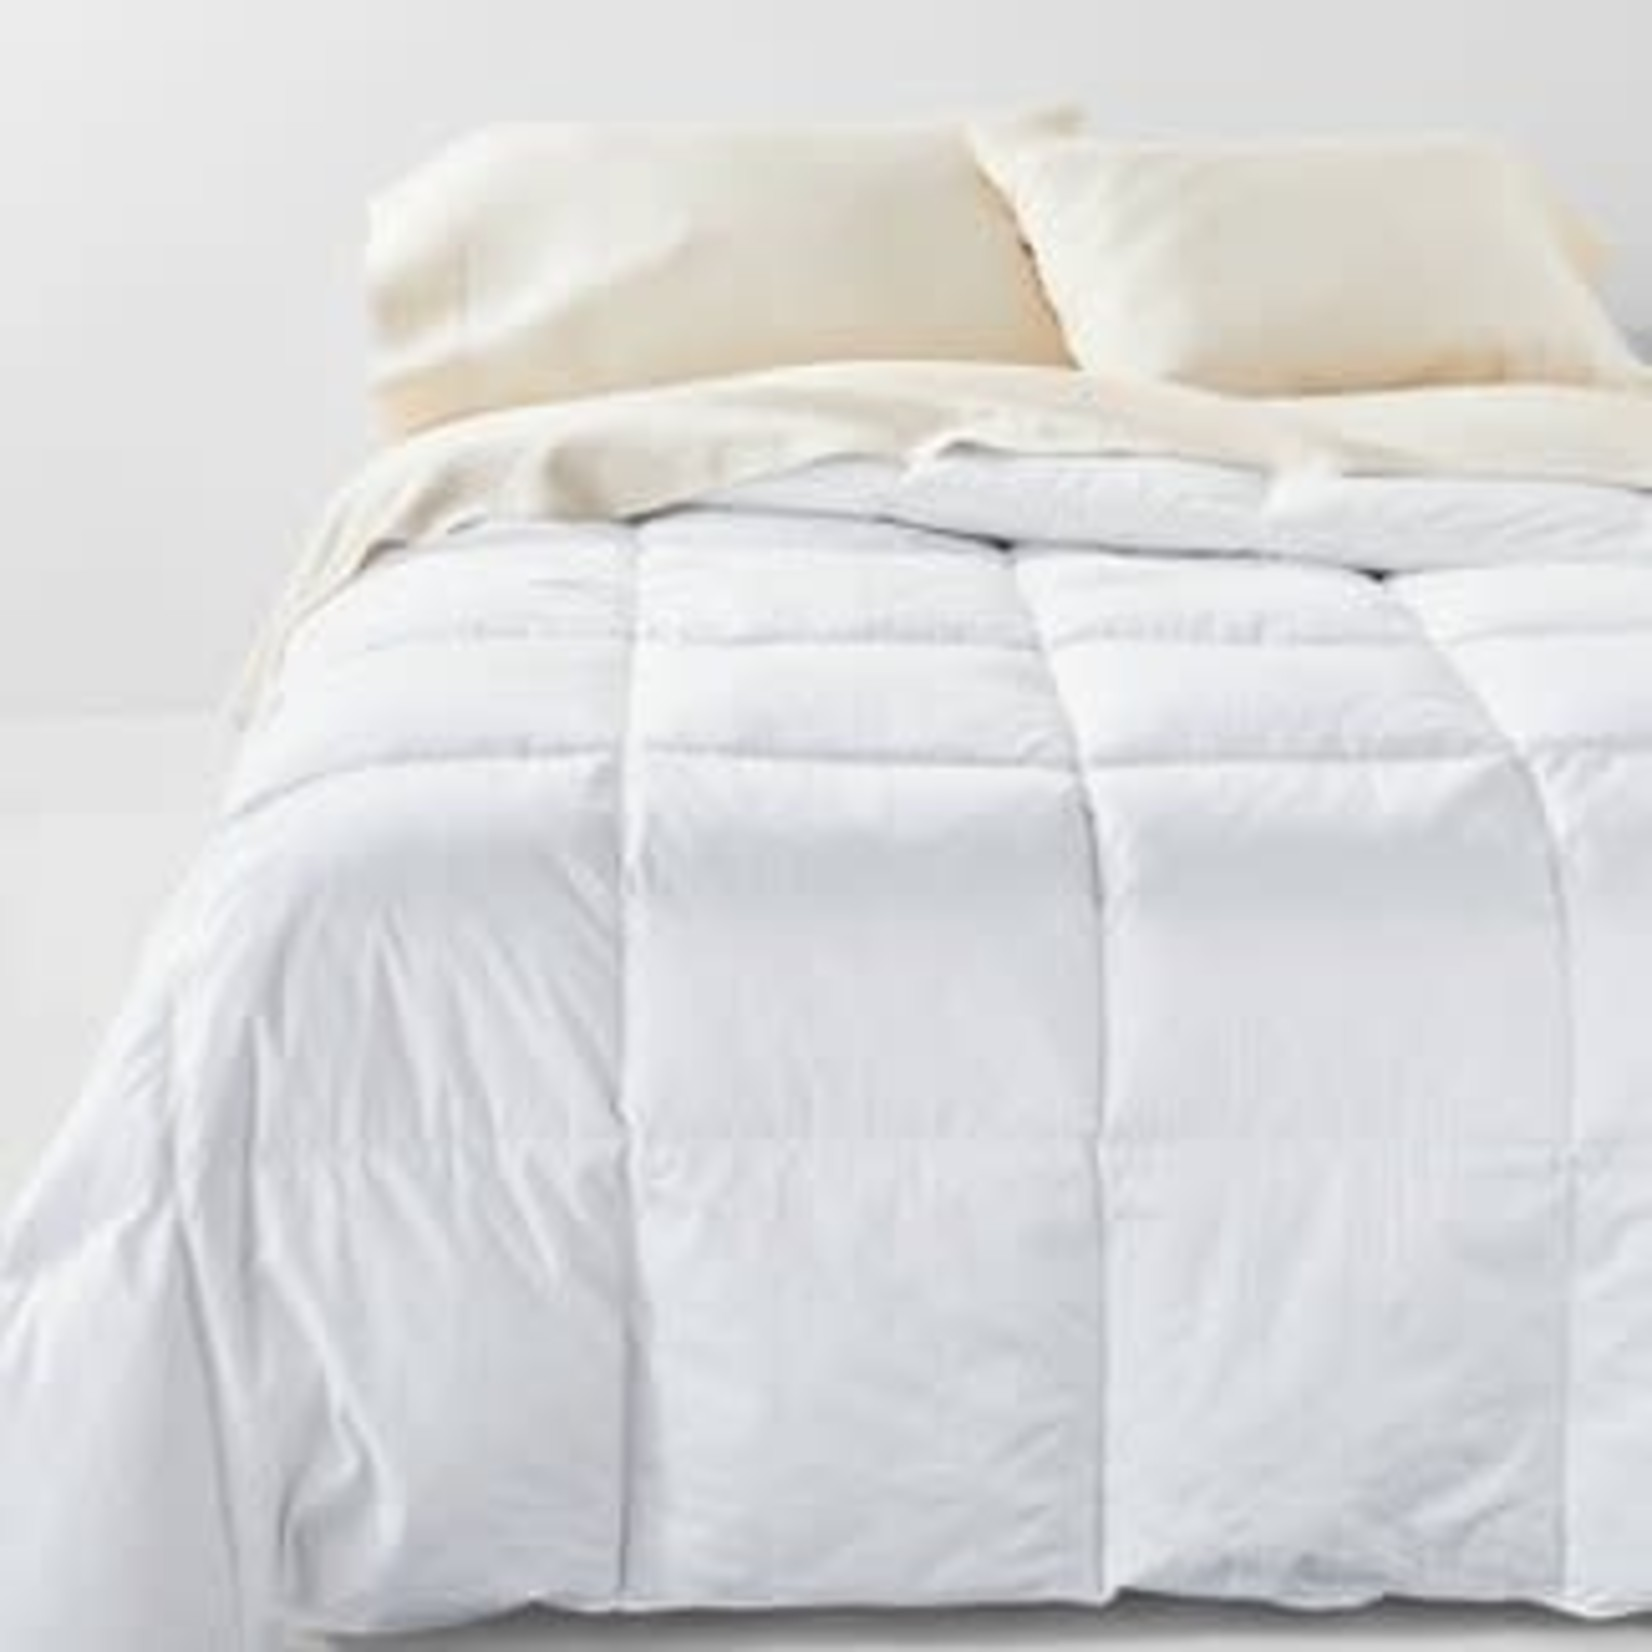 Casaluna Ultra Weight 600 Fill Power Premium Duck Down Hypoallergenic RDS Certified Machine Washable Comforter -KING